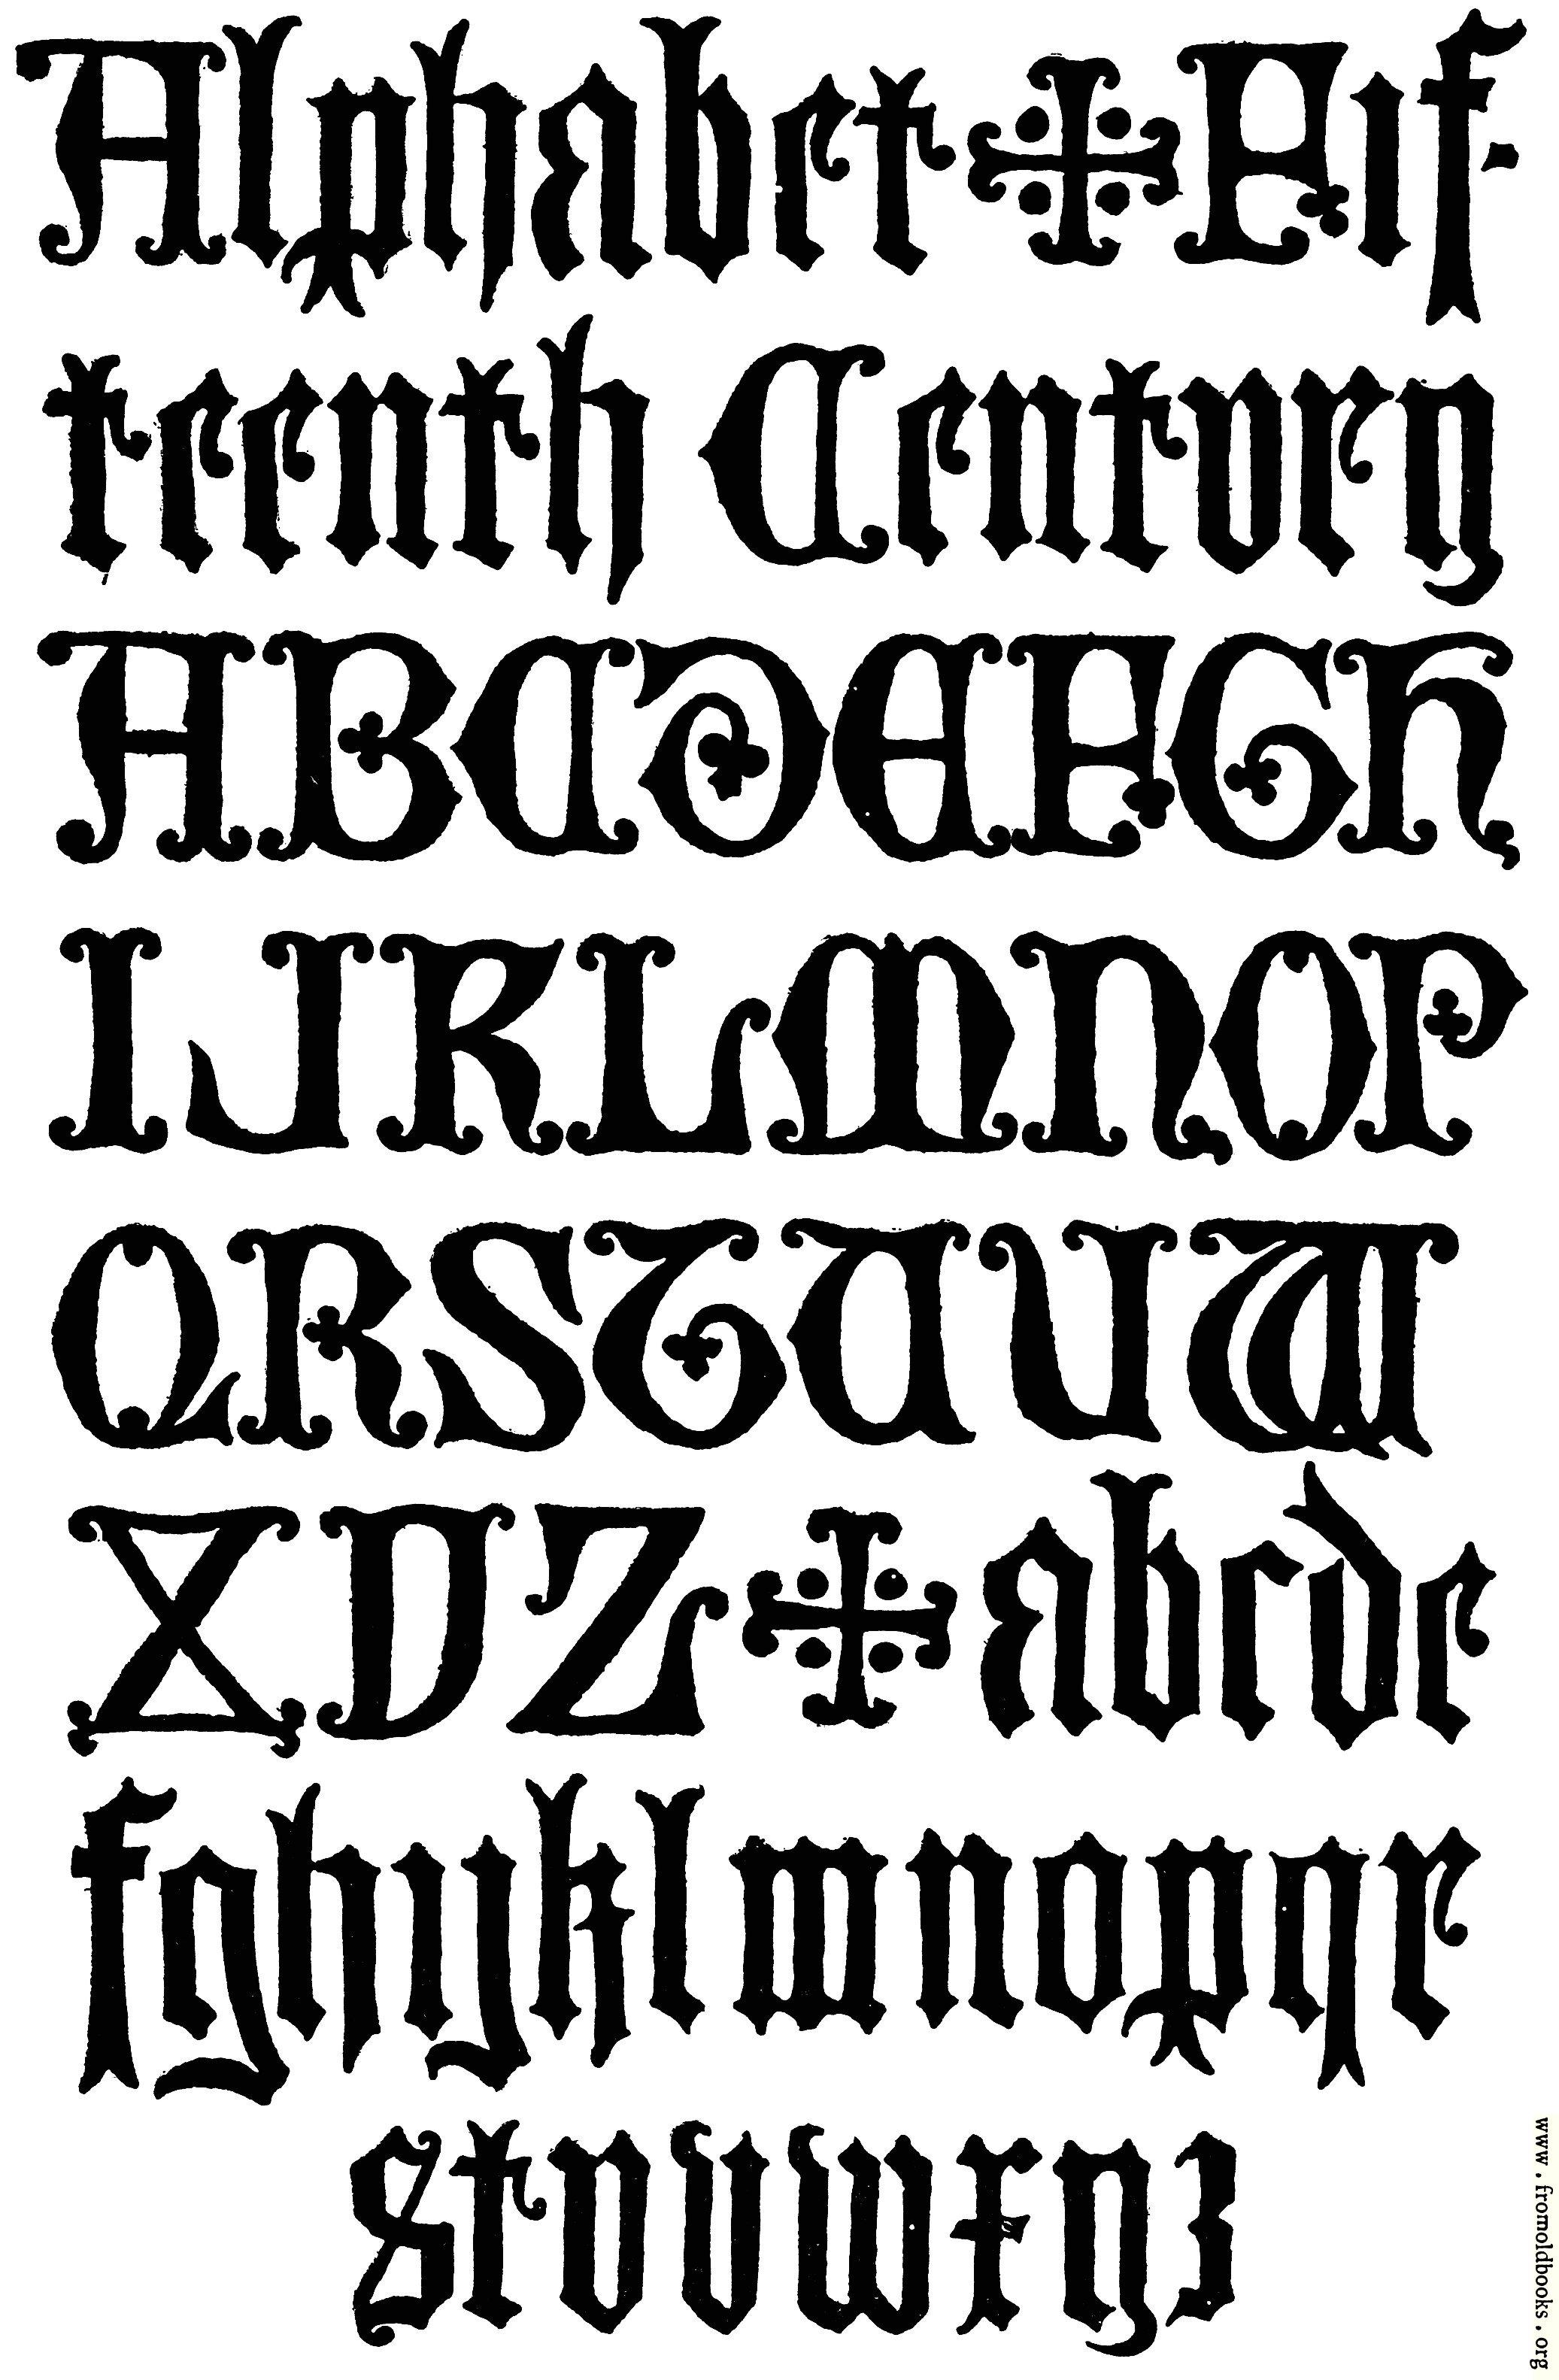 178 English Gothic Letters 15th Century F C B